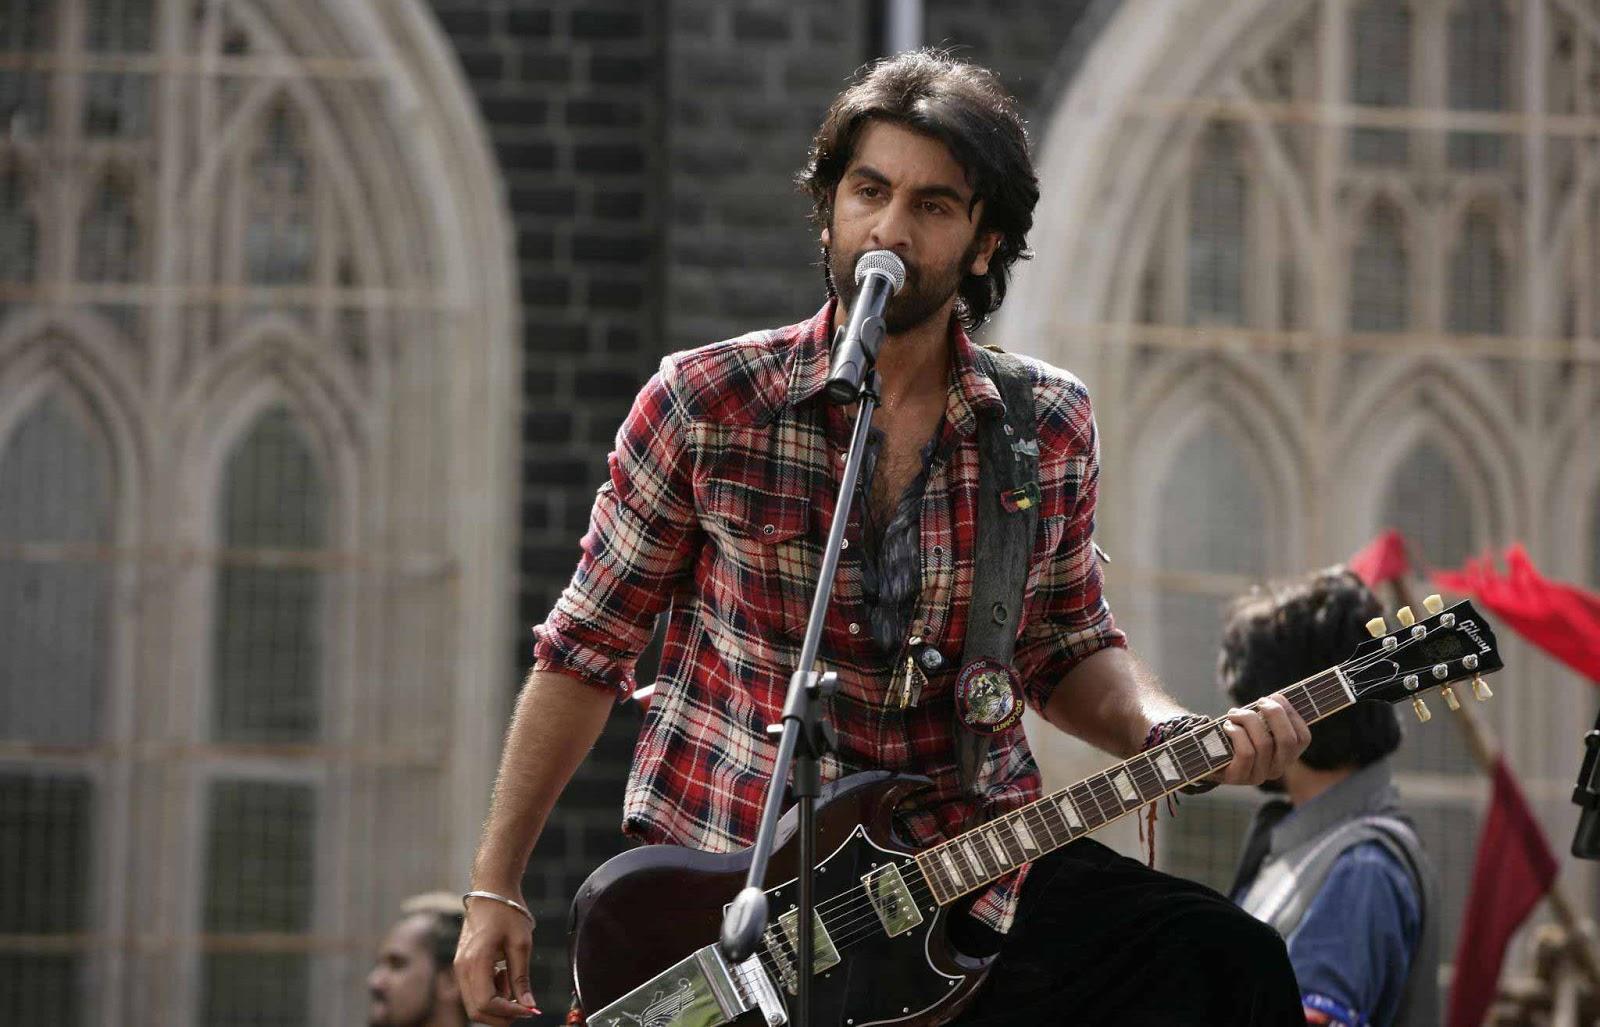 ranbir kapoor rockstar movie - photo #4